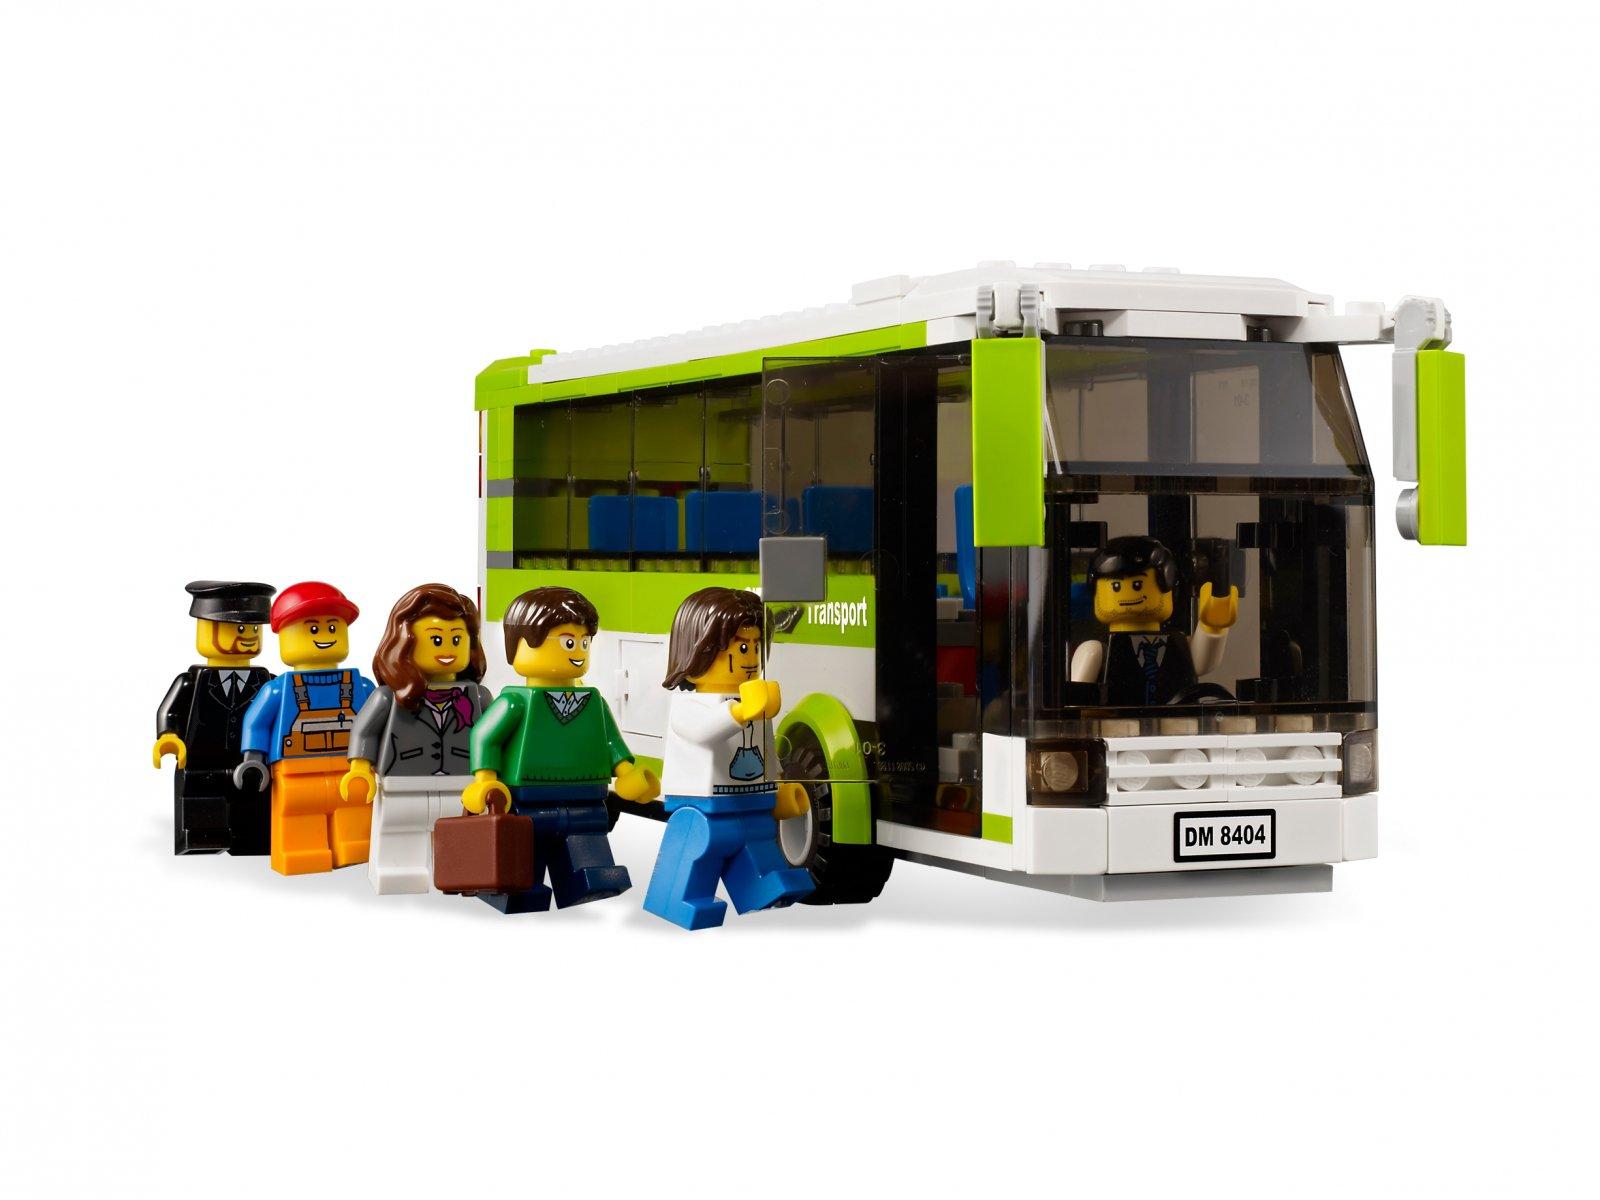 LEGO City Public Transport 8404